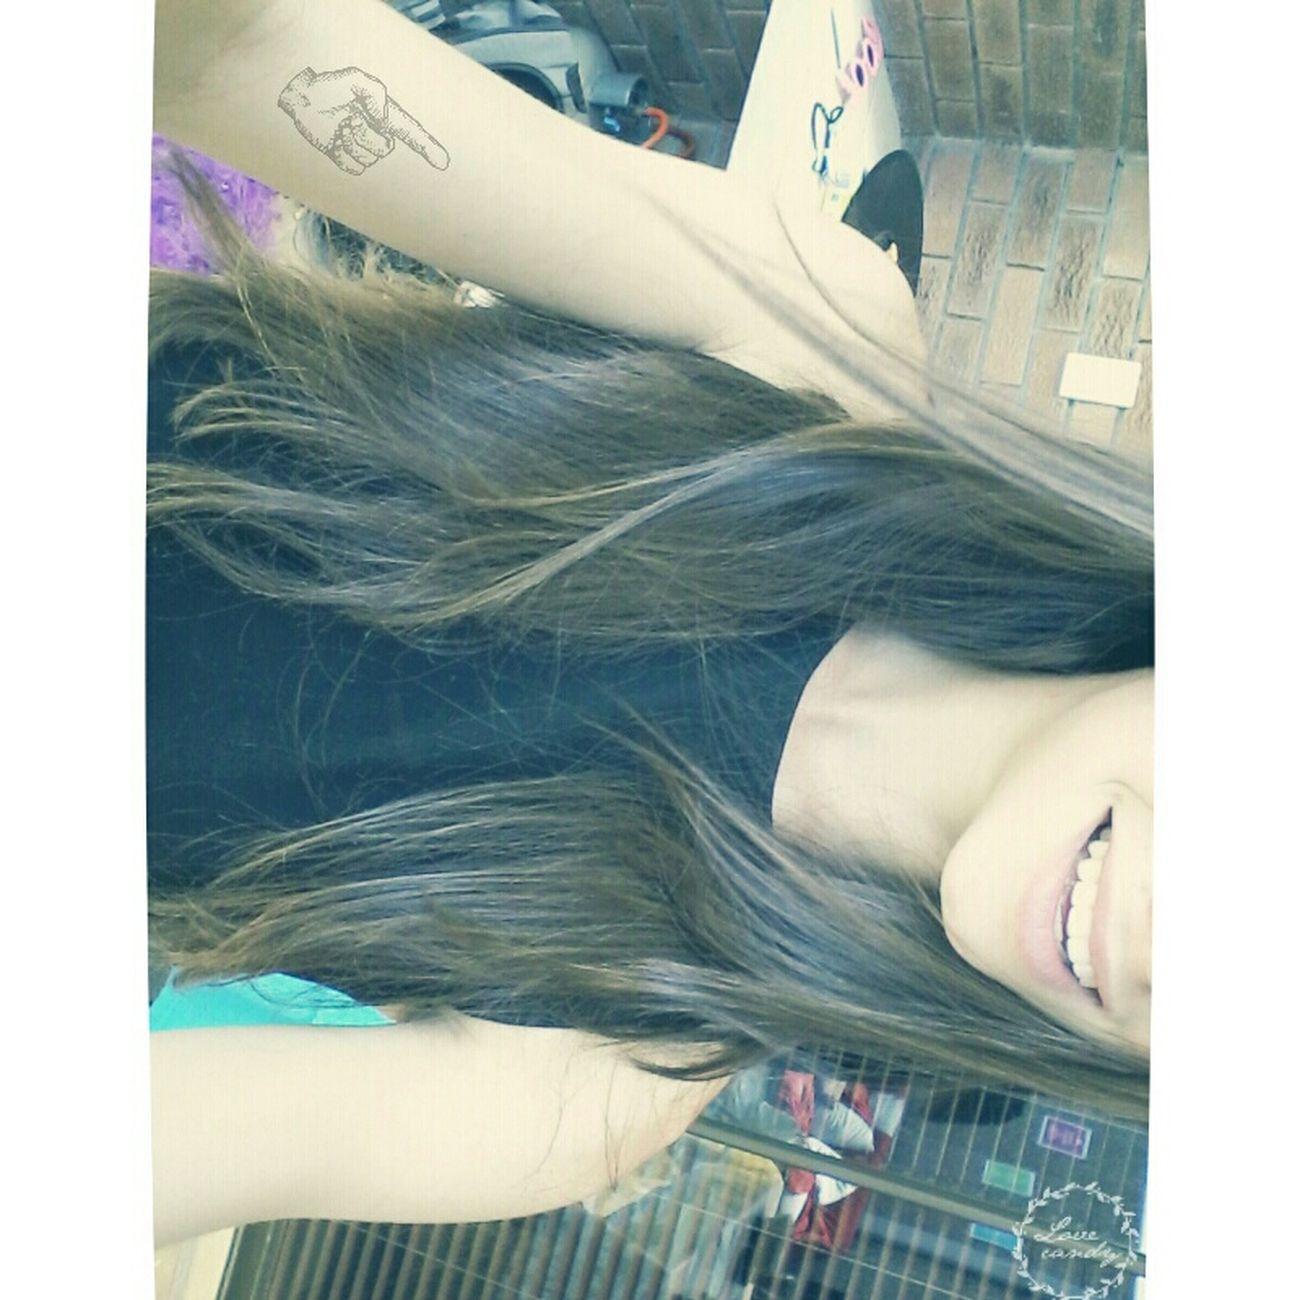 tattoo love Smile RAD coco 👌✊✌ Drop It Like It's Hot Redlips💋